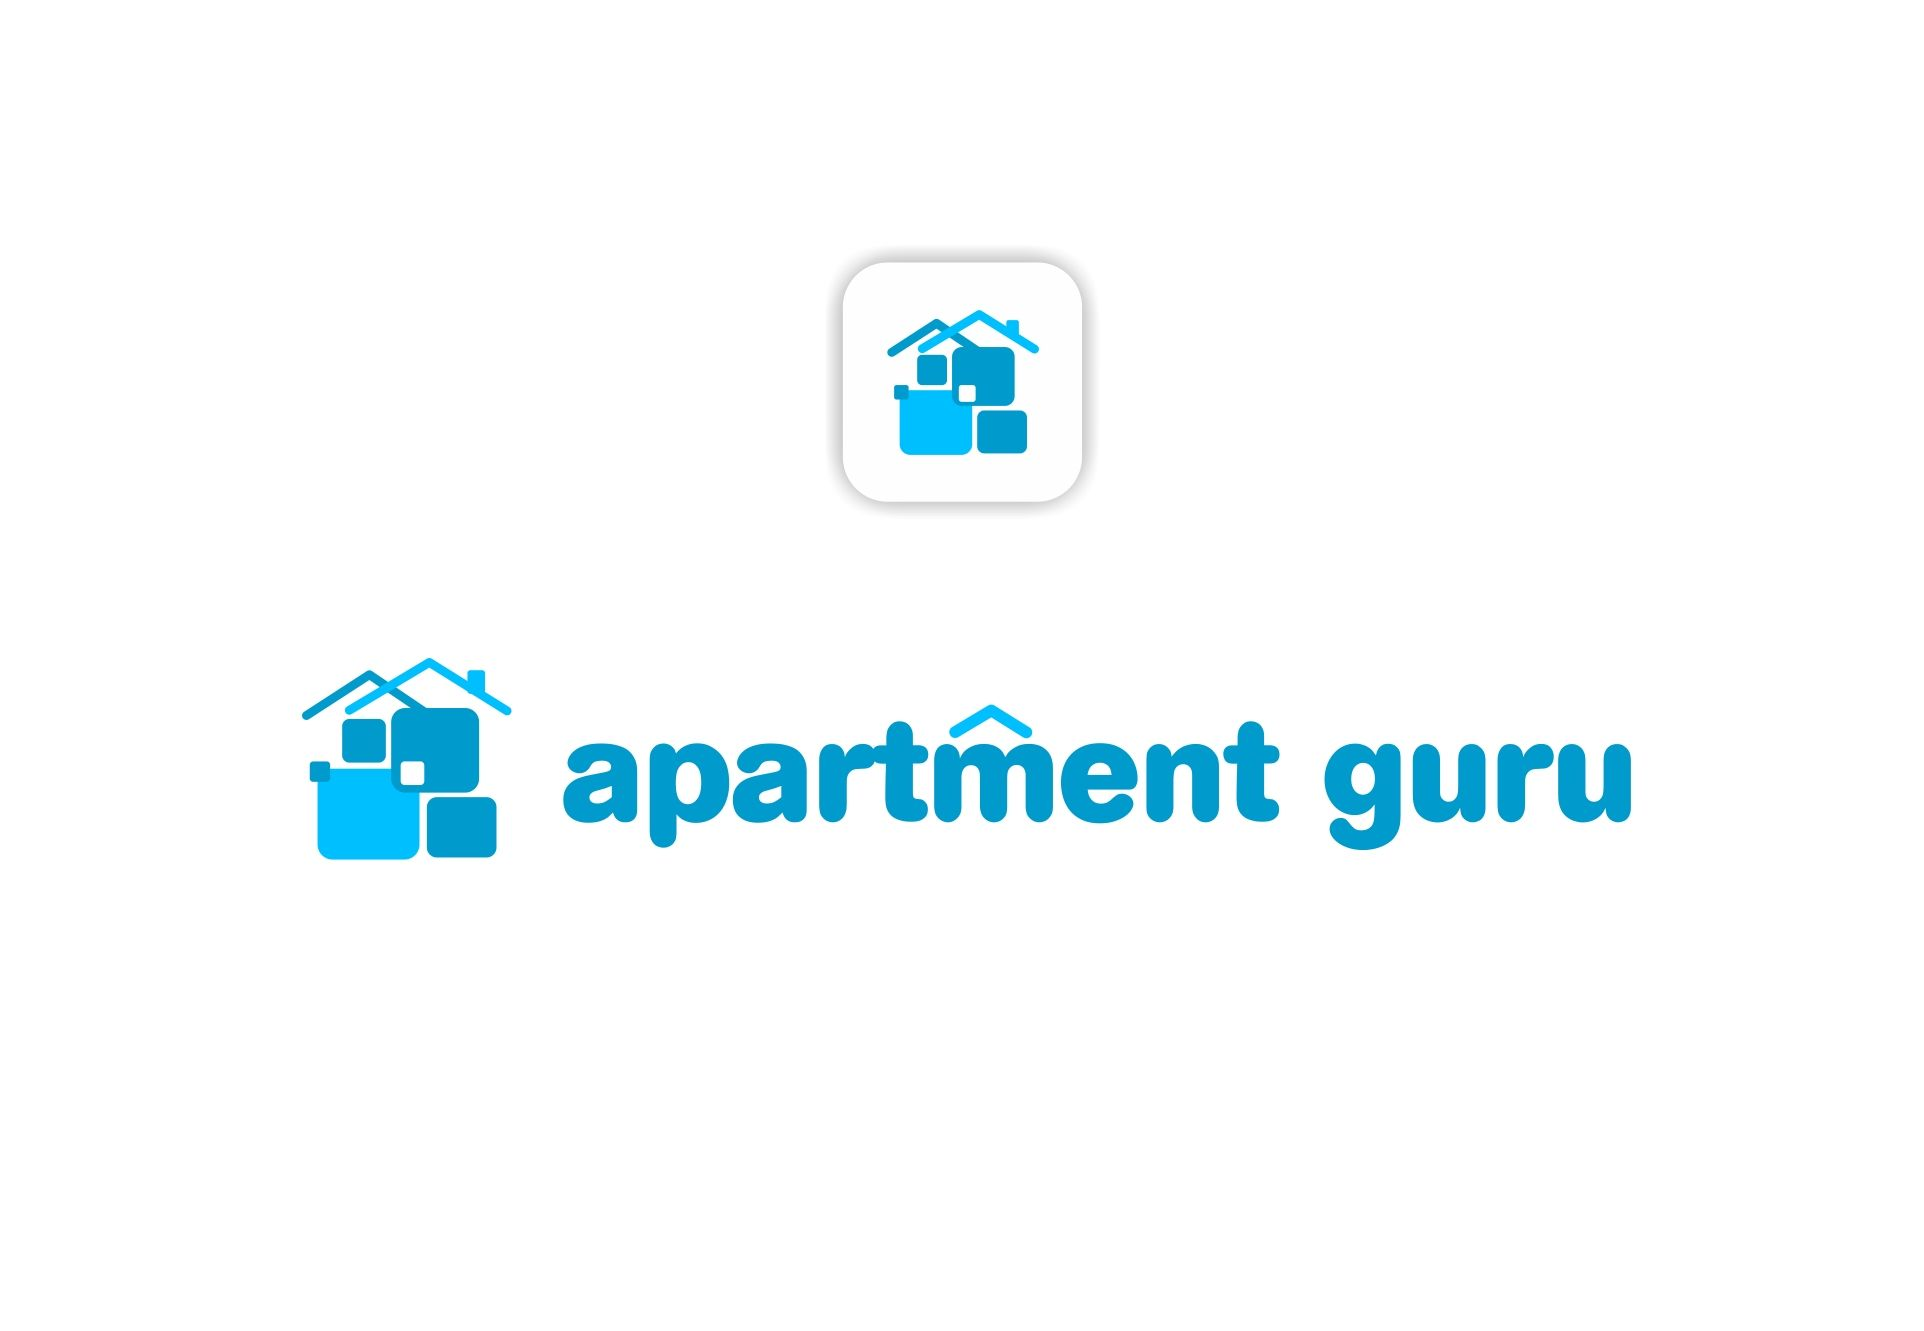 Дизайн логотипа сайта apartment guru - дизайнер oksana123456